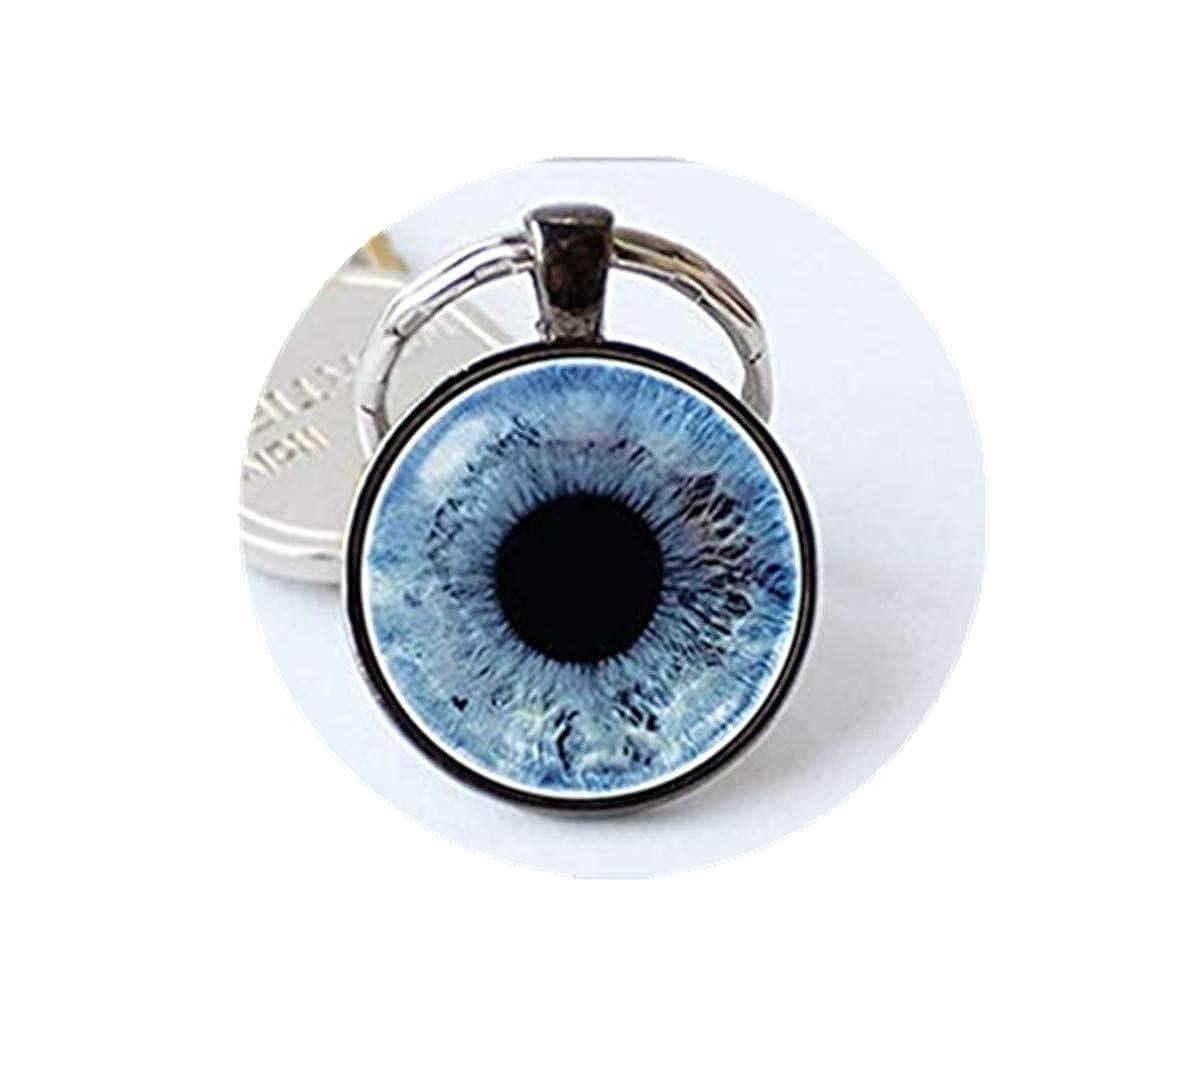 Amazon.com: Llavero de ojo de diablo azul con ojo humano ...